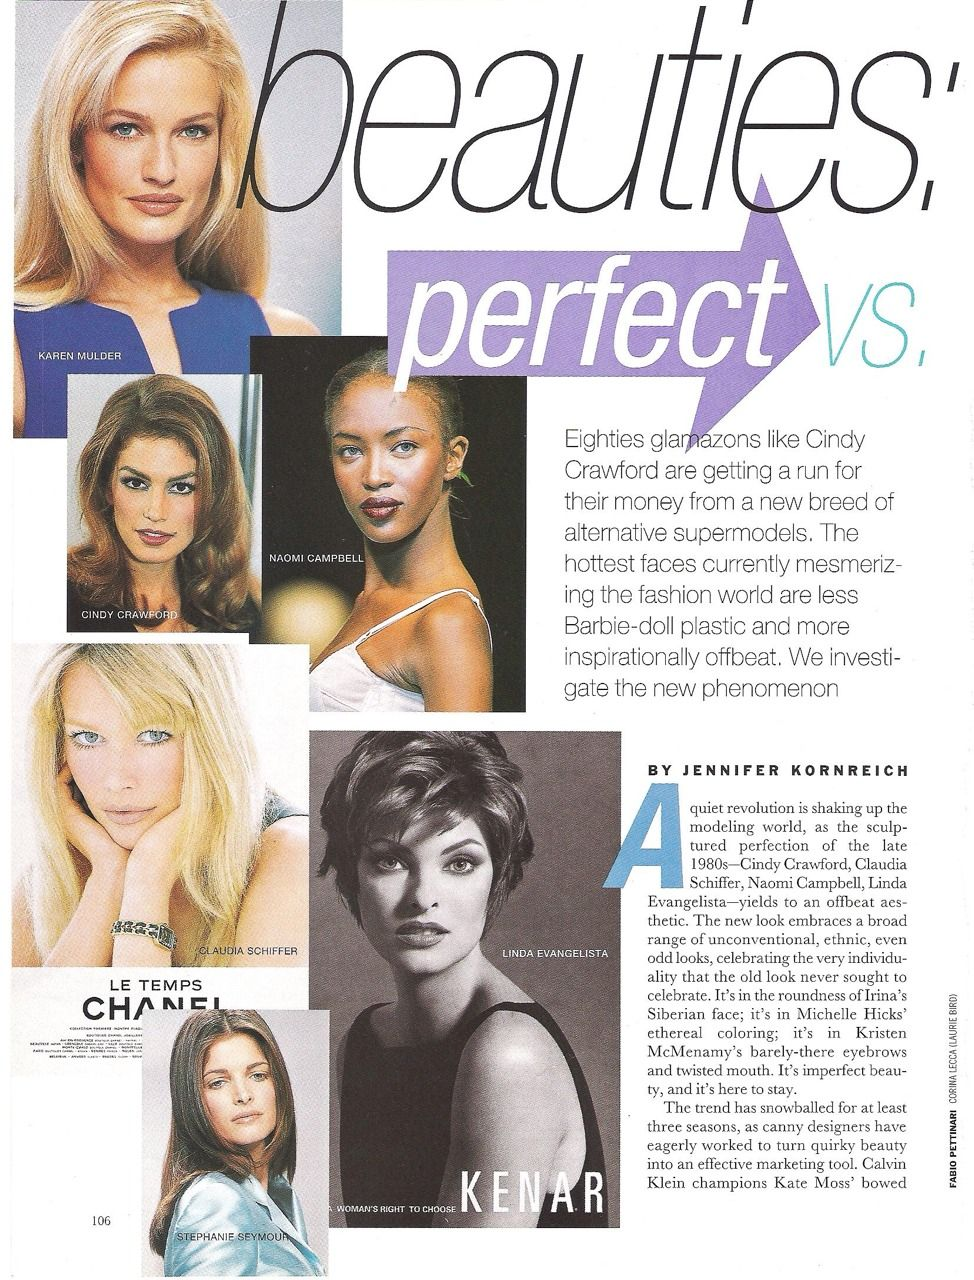 90s supermodels: karen, cindy, naomi, linda, stephanie